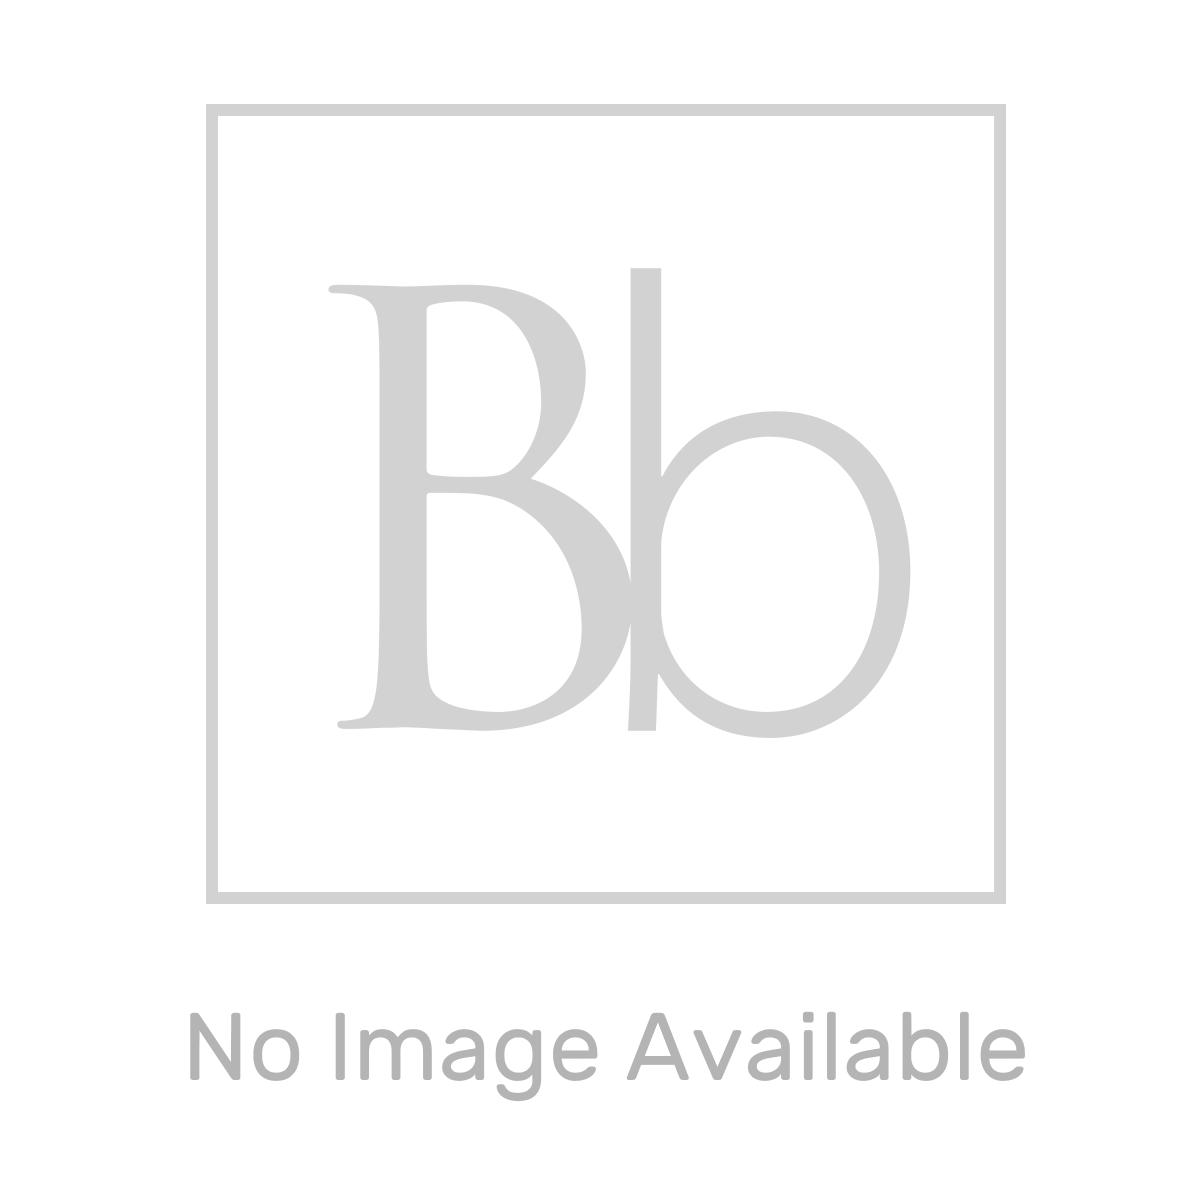 RAK Ecofix Flush Plate with Polished Chrome Dual Round Push Plates Measurements